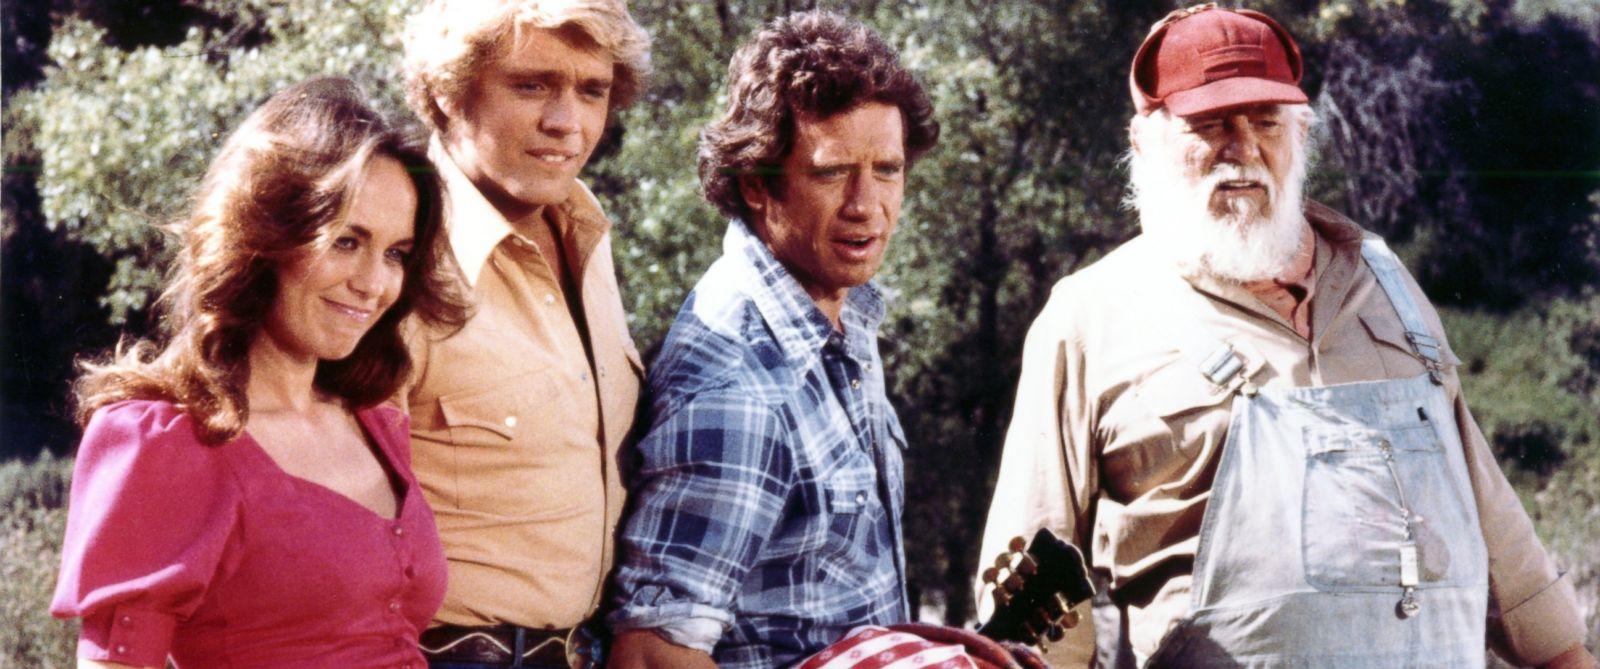 TV Land Pulls 'Dukes Of Hazzard' Reruns ABC News - 1600x669 - jpeg